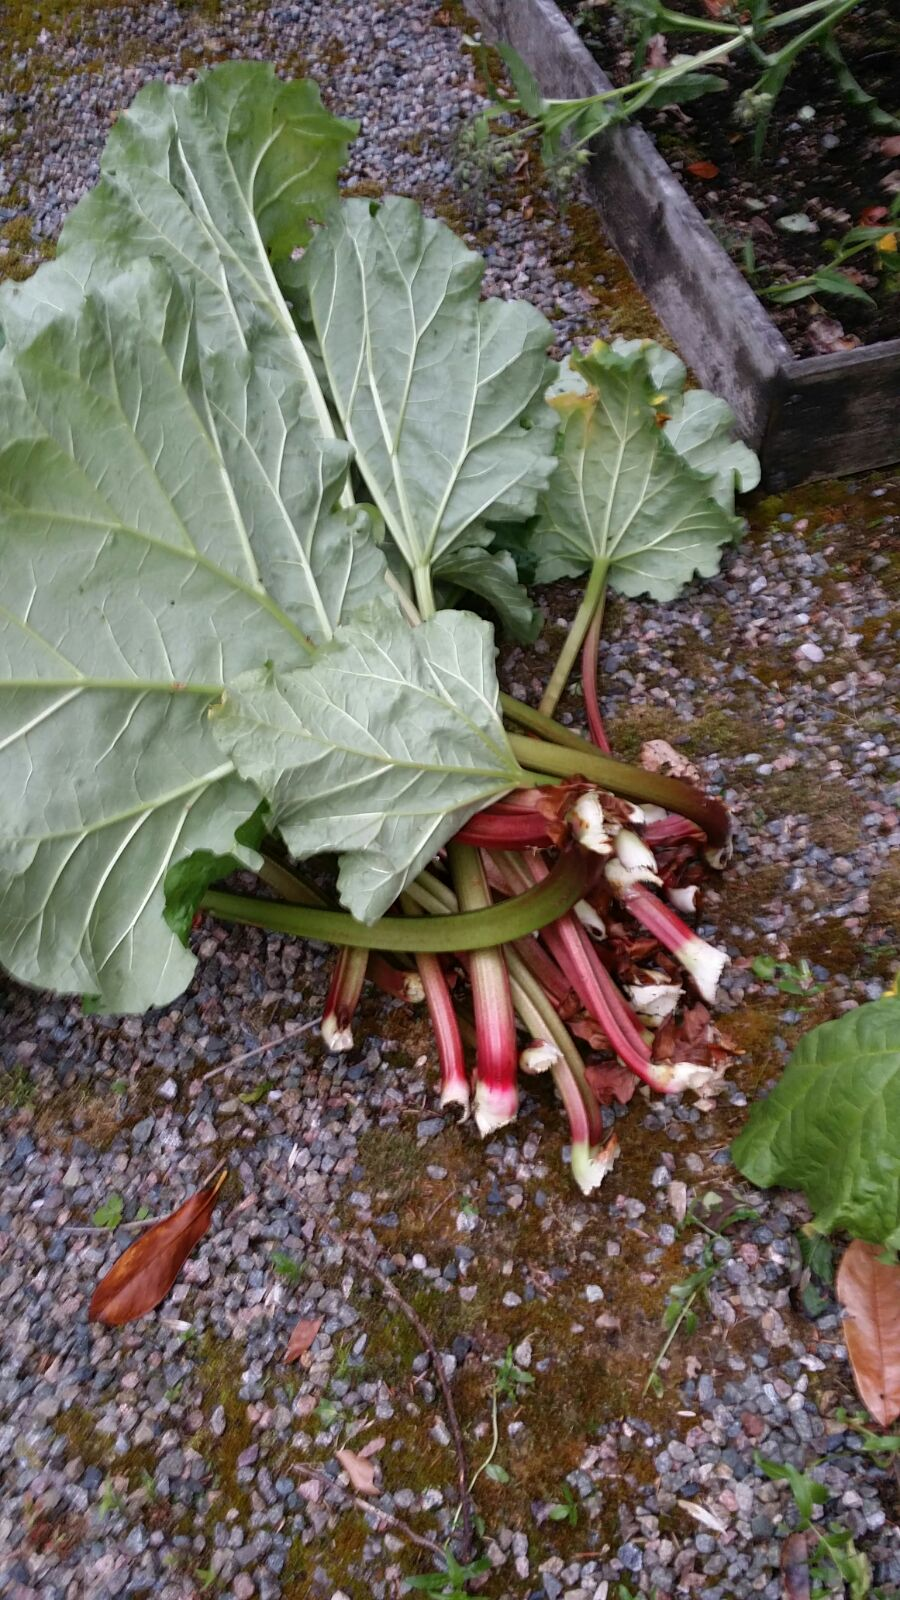 dromore house rhubarb